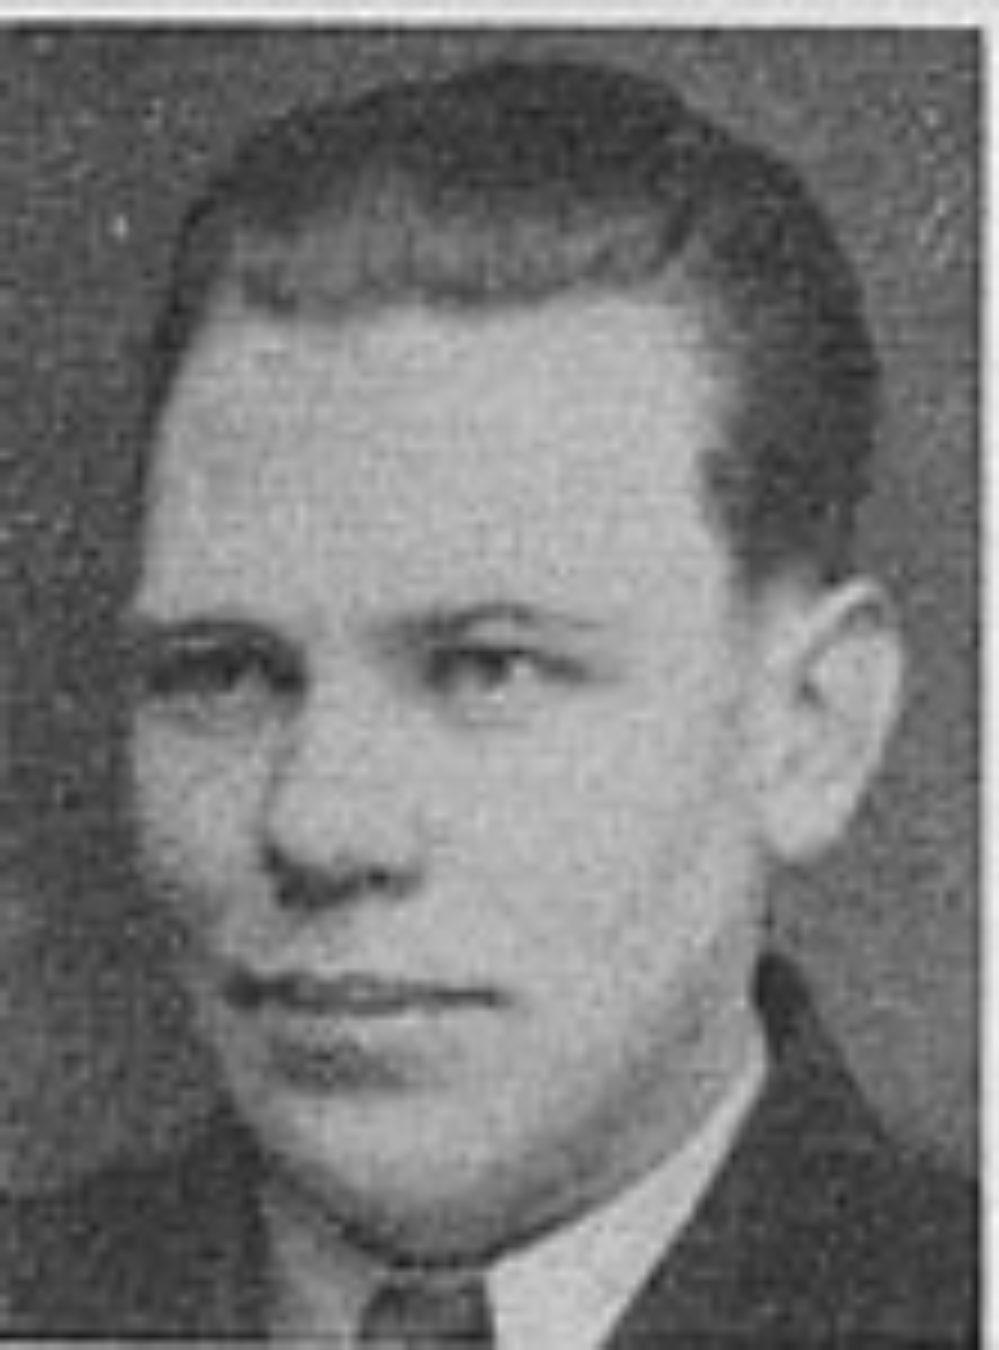 Arne Ingebjørn Hansen